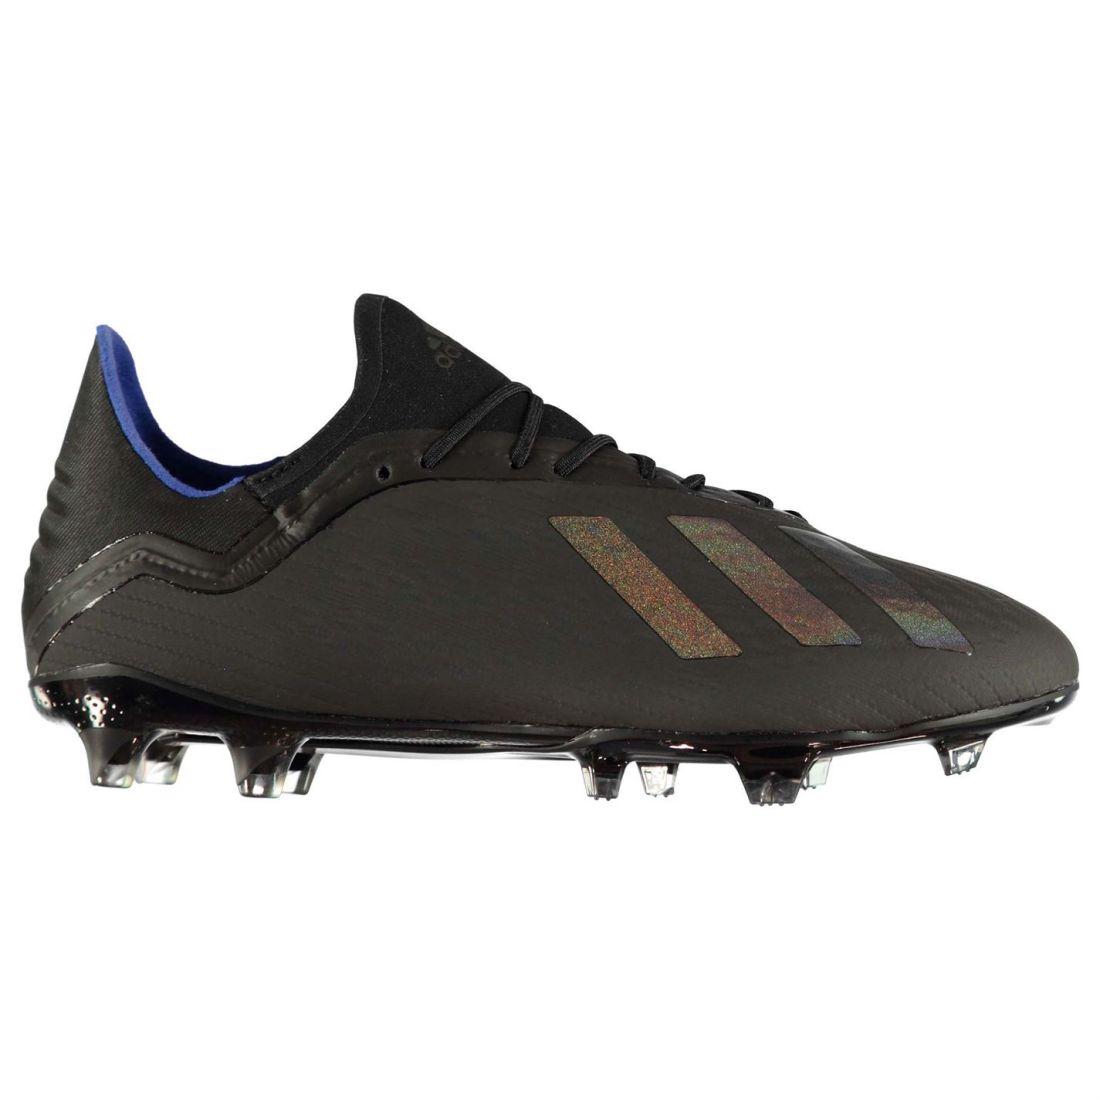 Adidas Mens X 18.2 FG Football Boots Firm Ground Lace Up Lightweight Mesh Upper